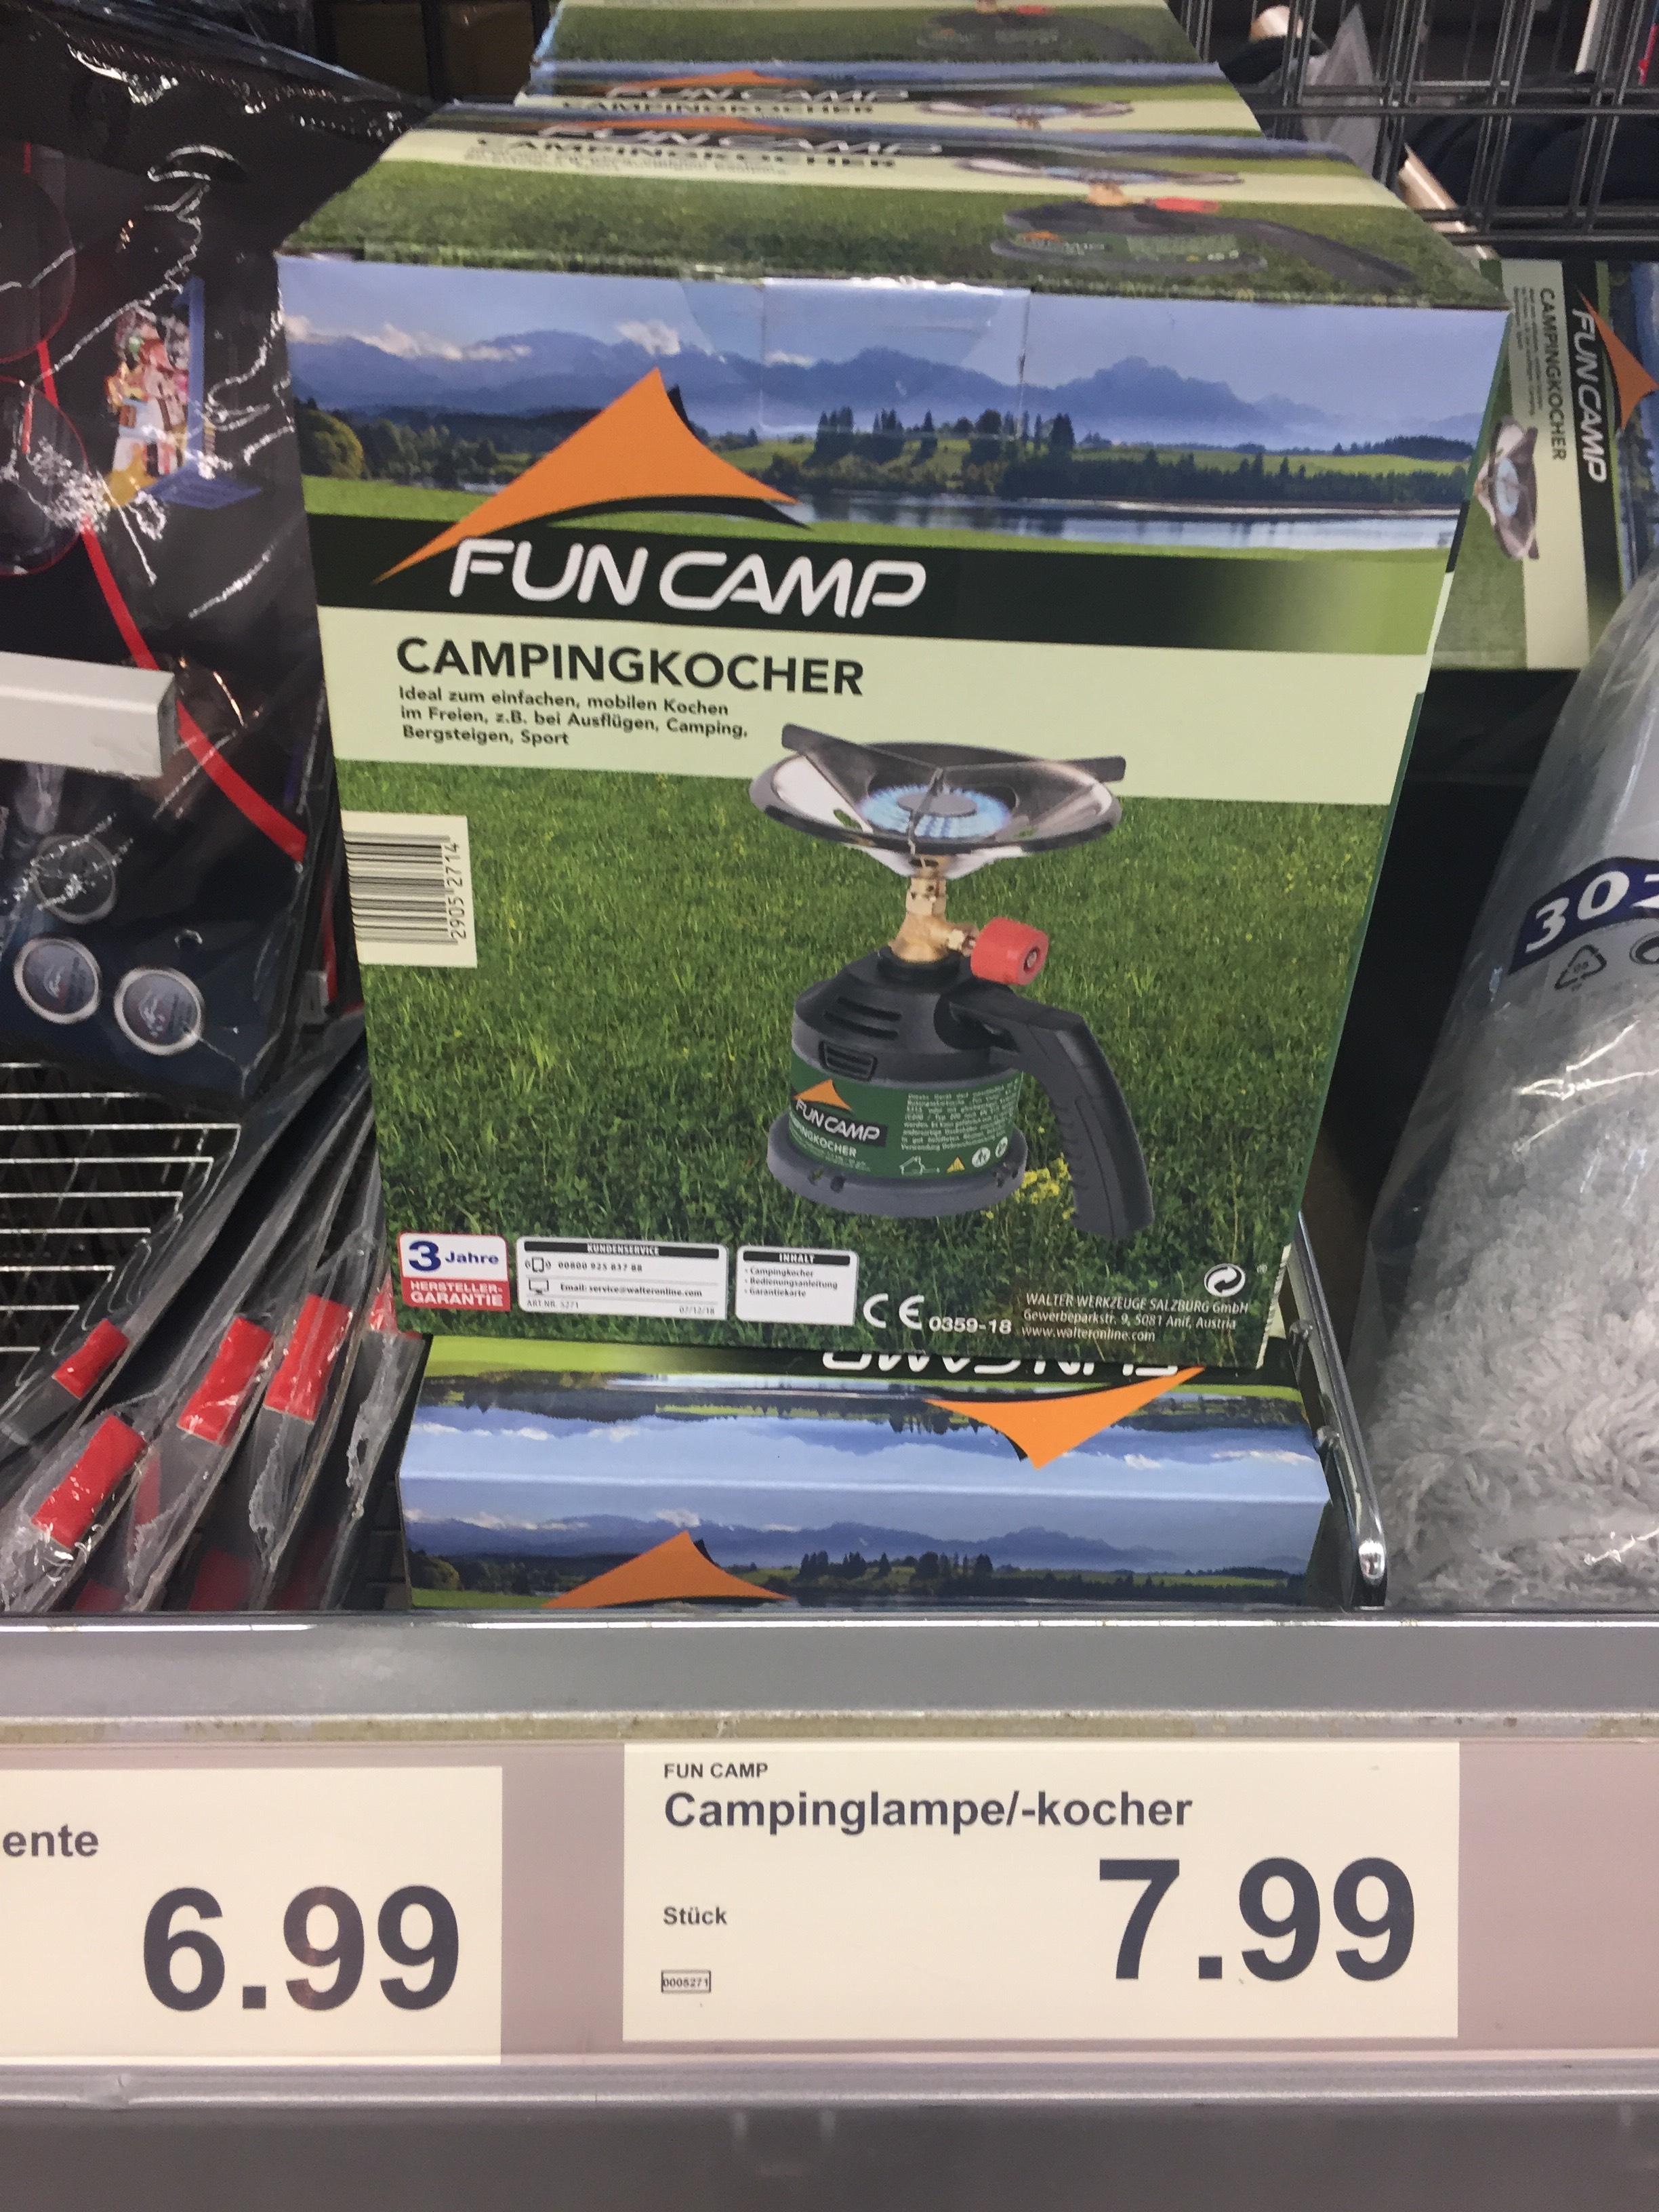 Camping Gaskocher / Lampe beim Aldi Berlin vielleicht Lokal